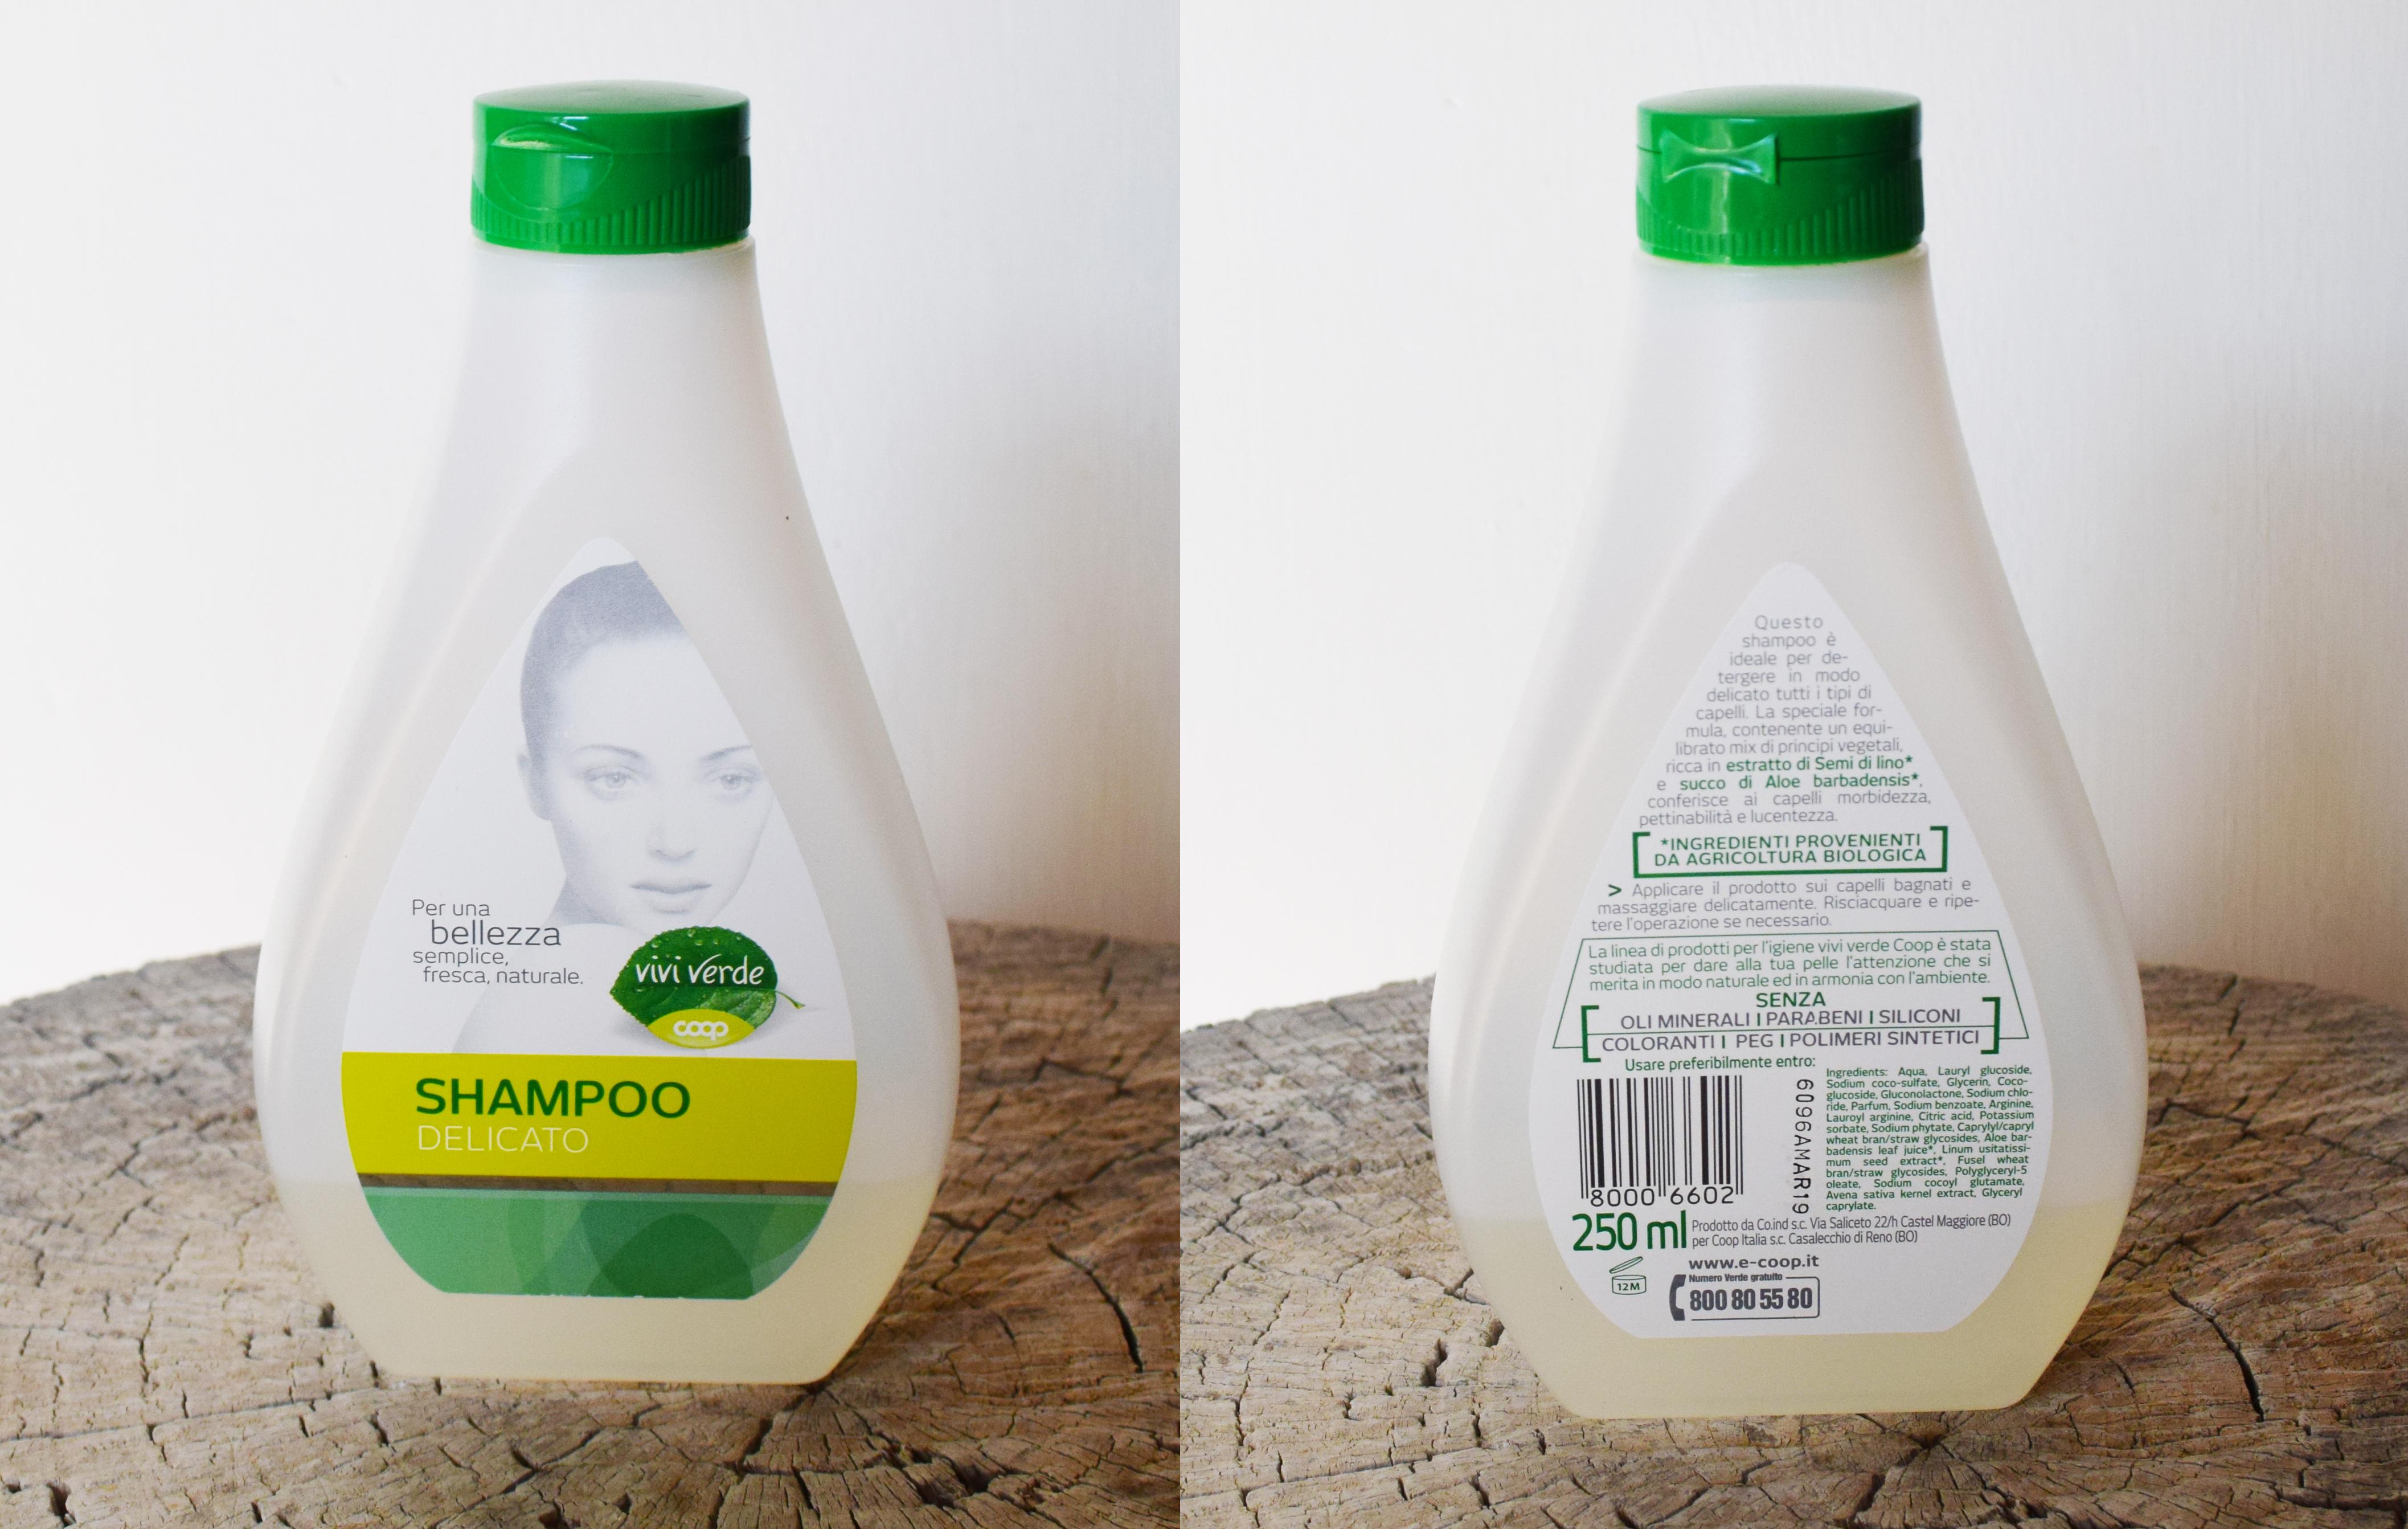 shampoo vivi verde coop